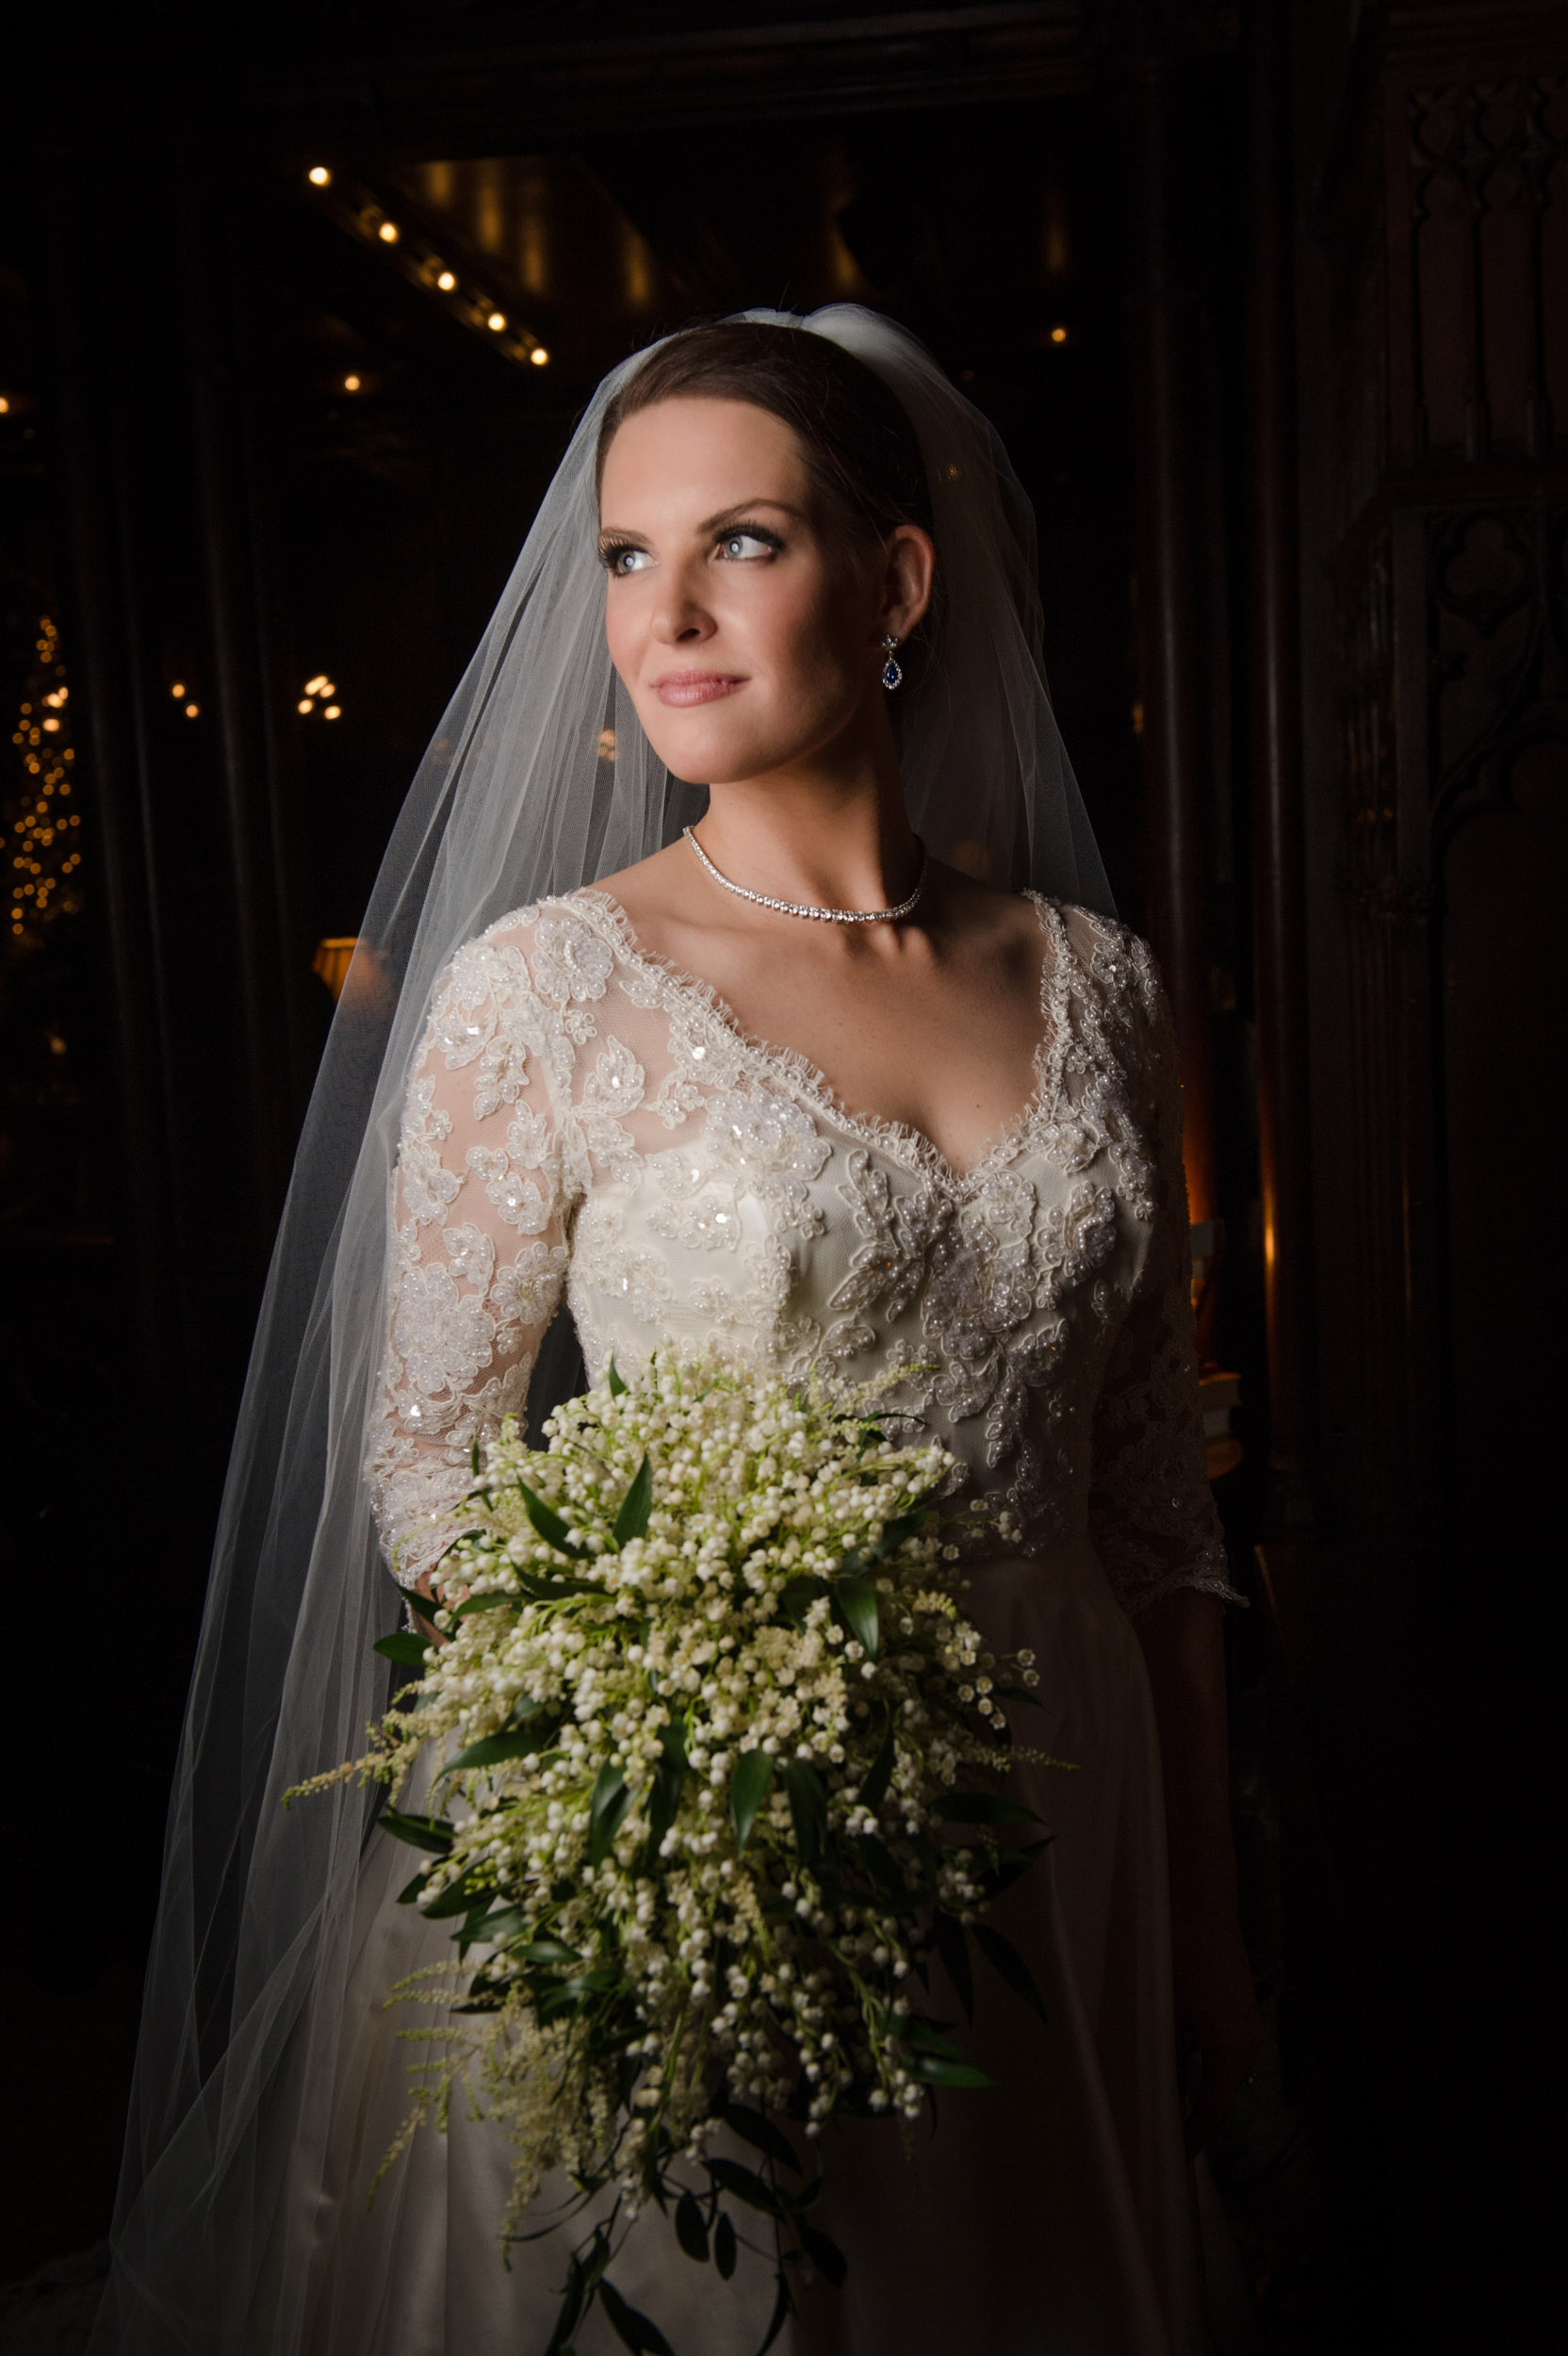 Bridal portrait at Chicago Athletic Association